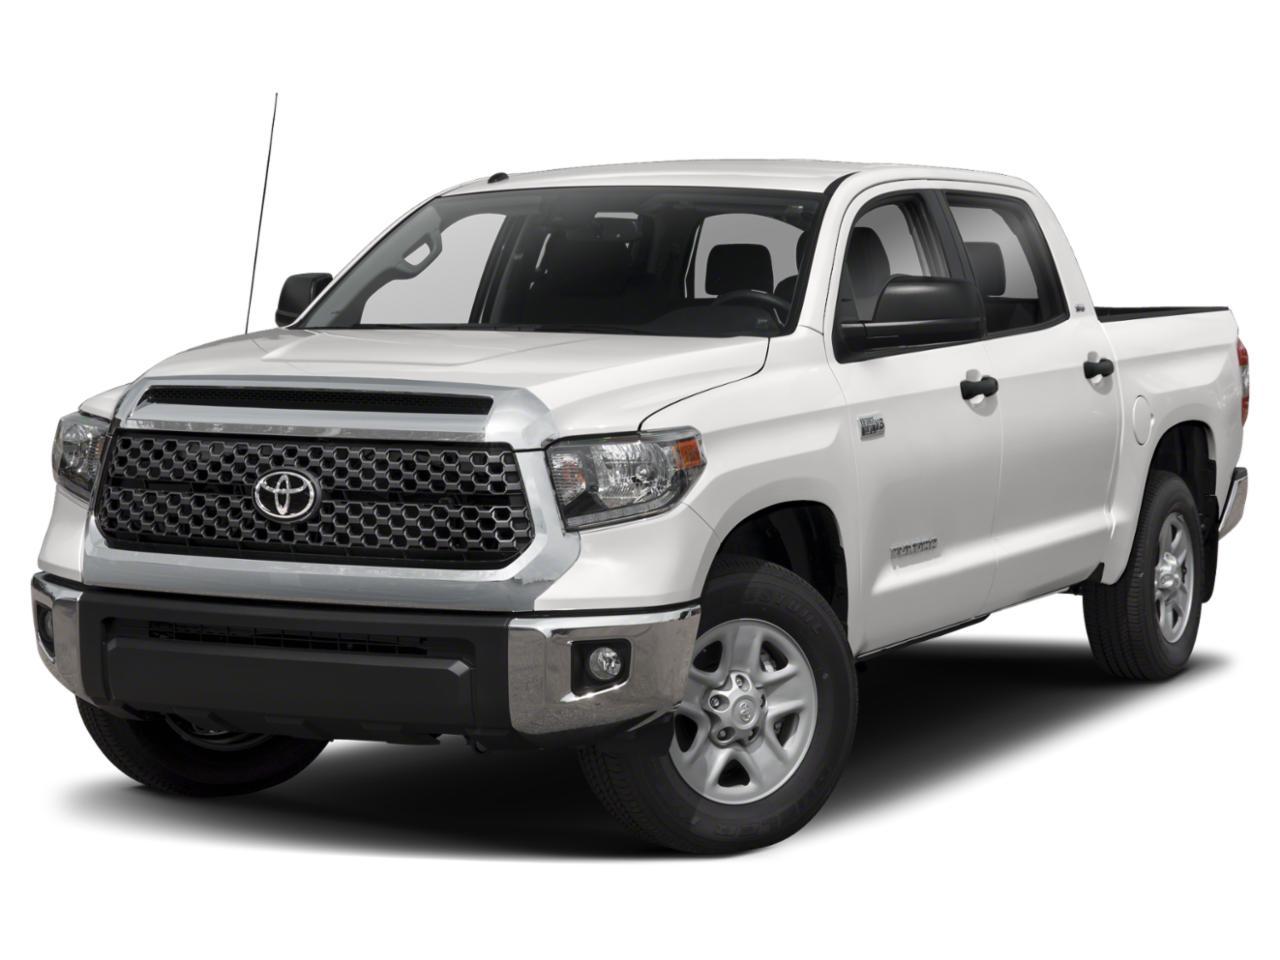 2018 Toyota Tundra 2WD Vehicle Photo in El Paso, TX 79936